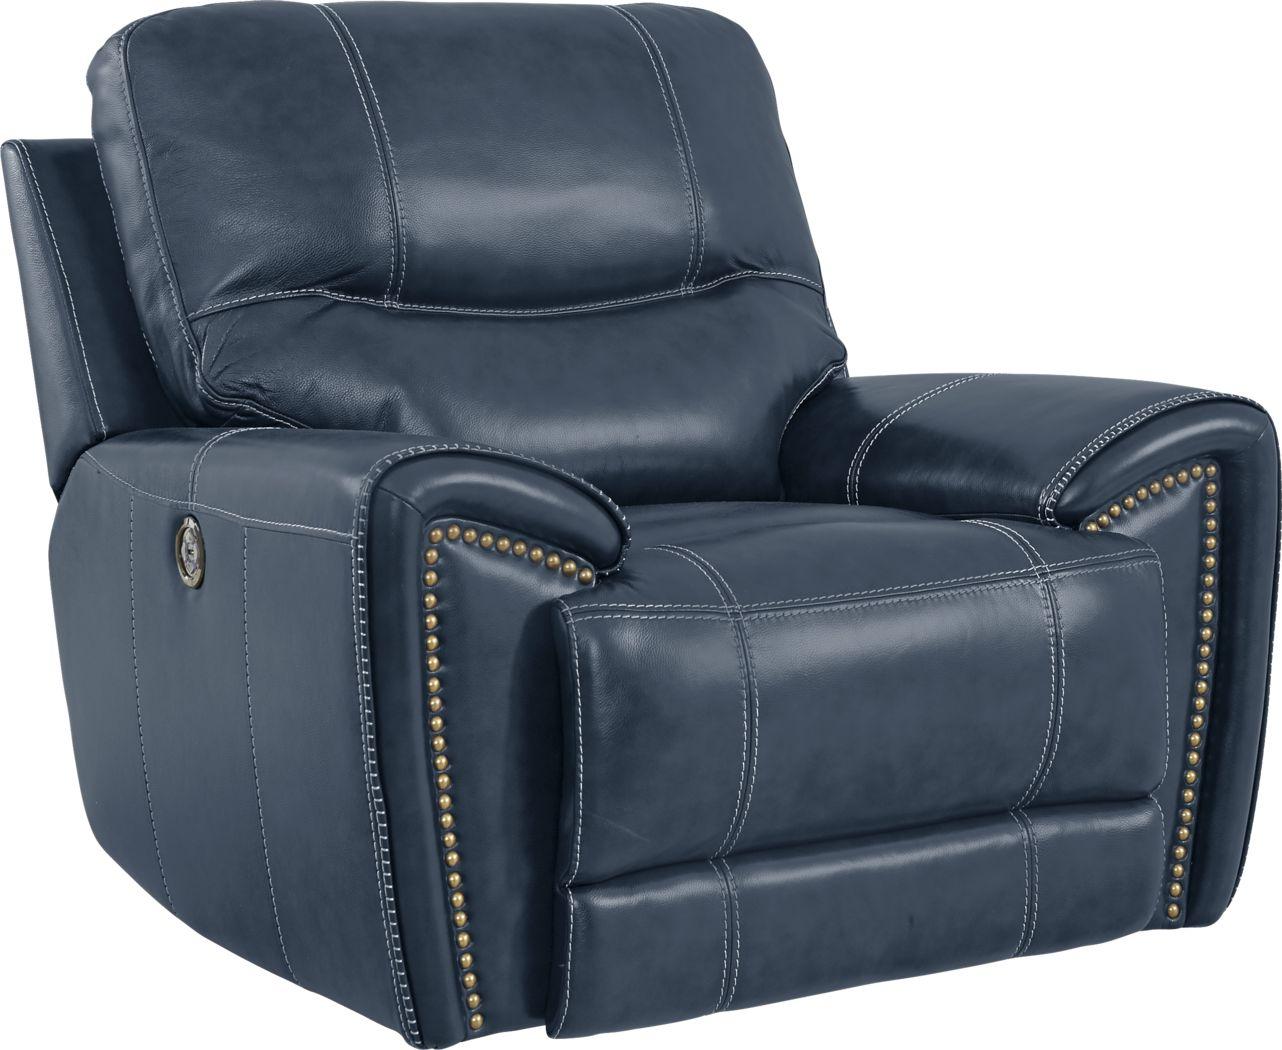 Italo Blue Leather Power Plus Recliner